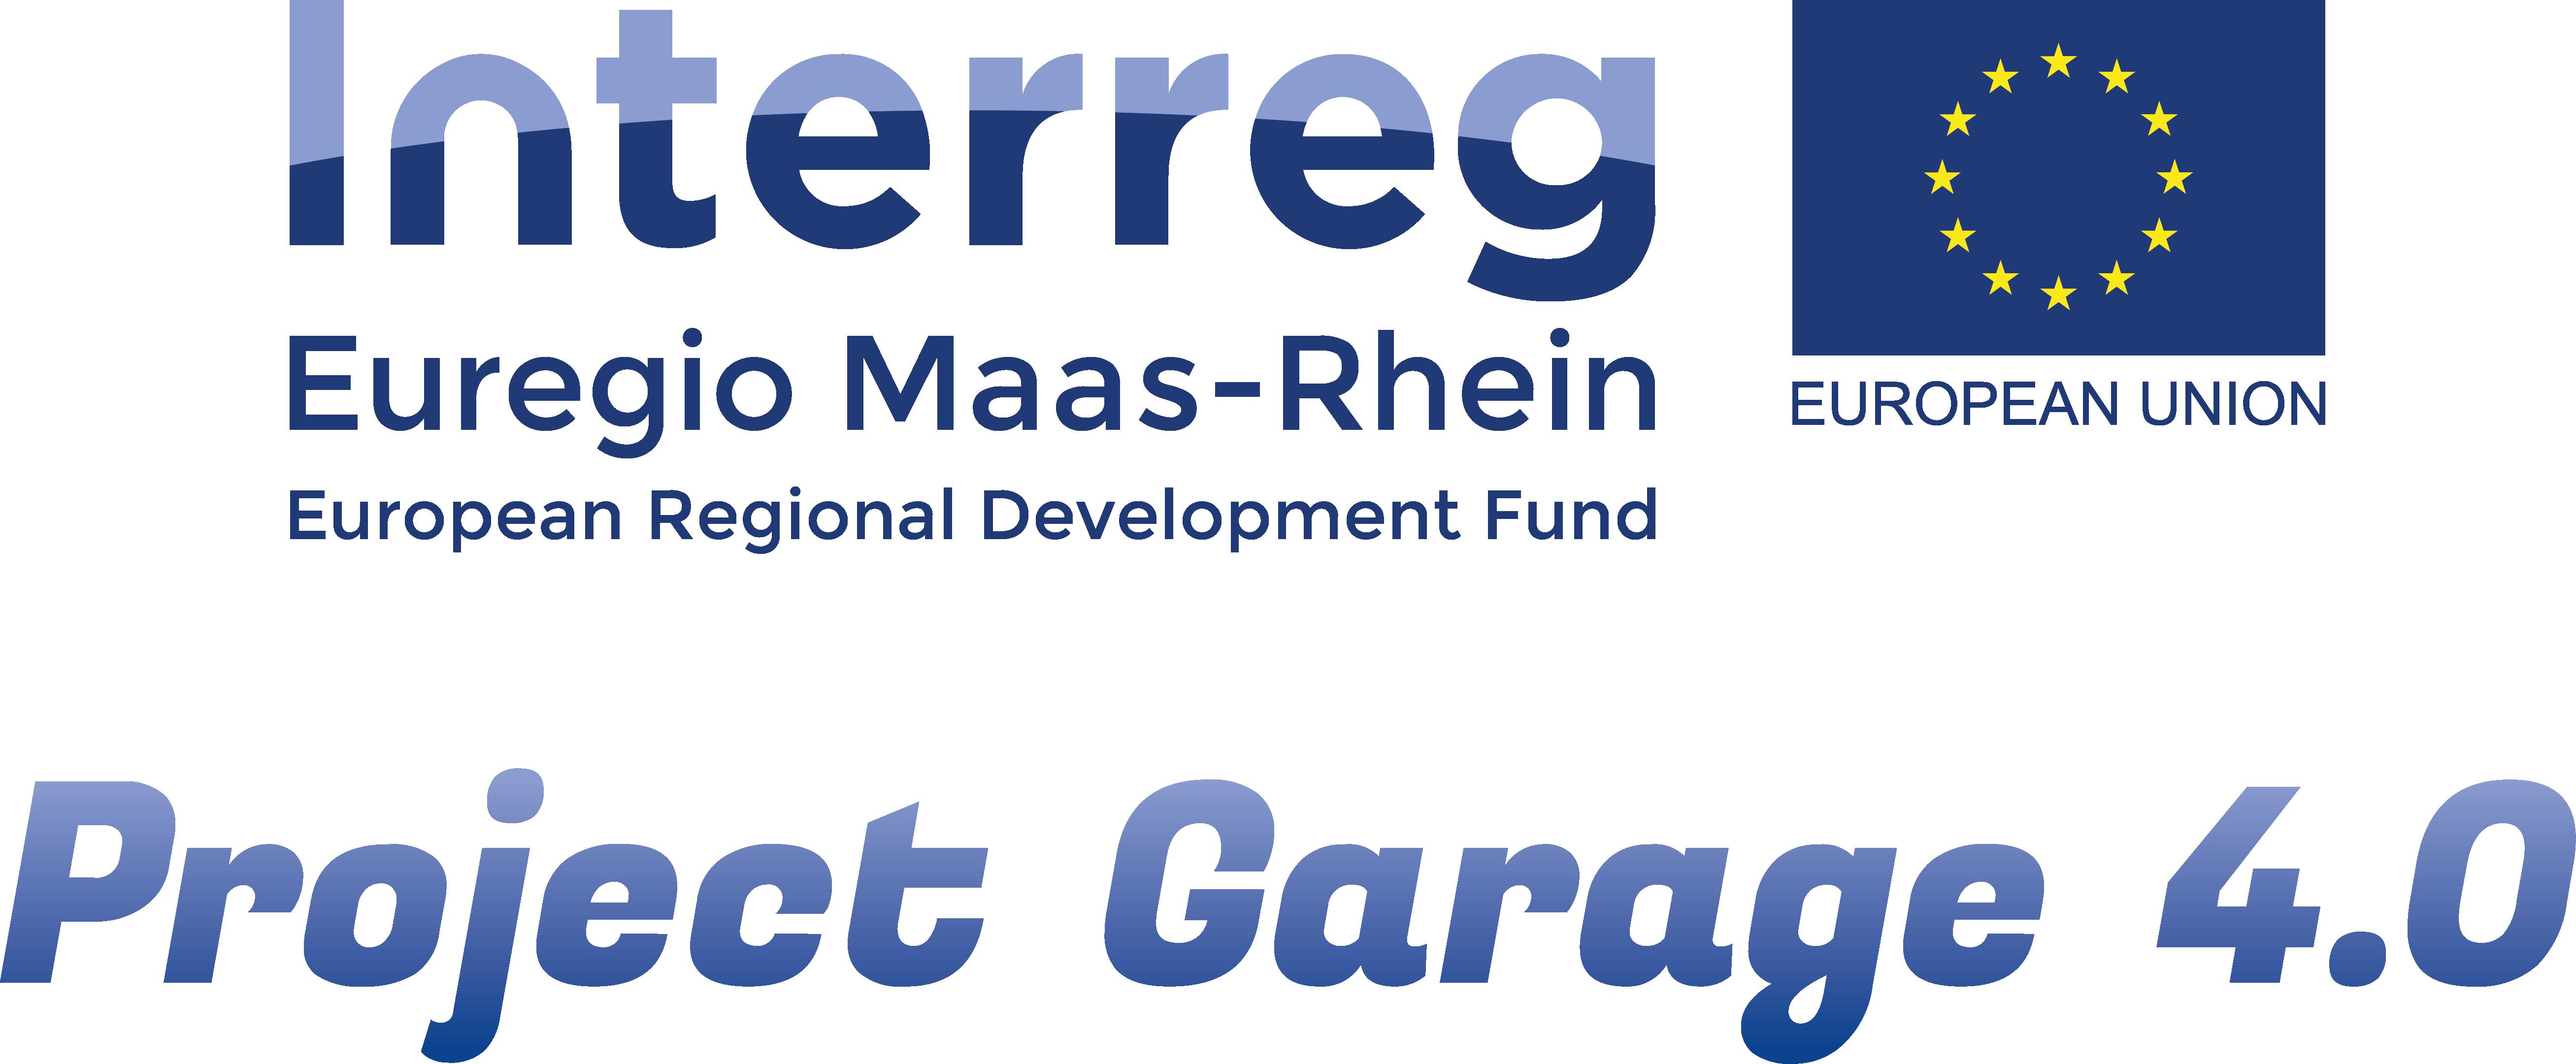 Project Garage 4.0